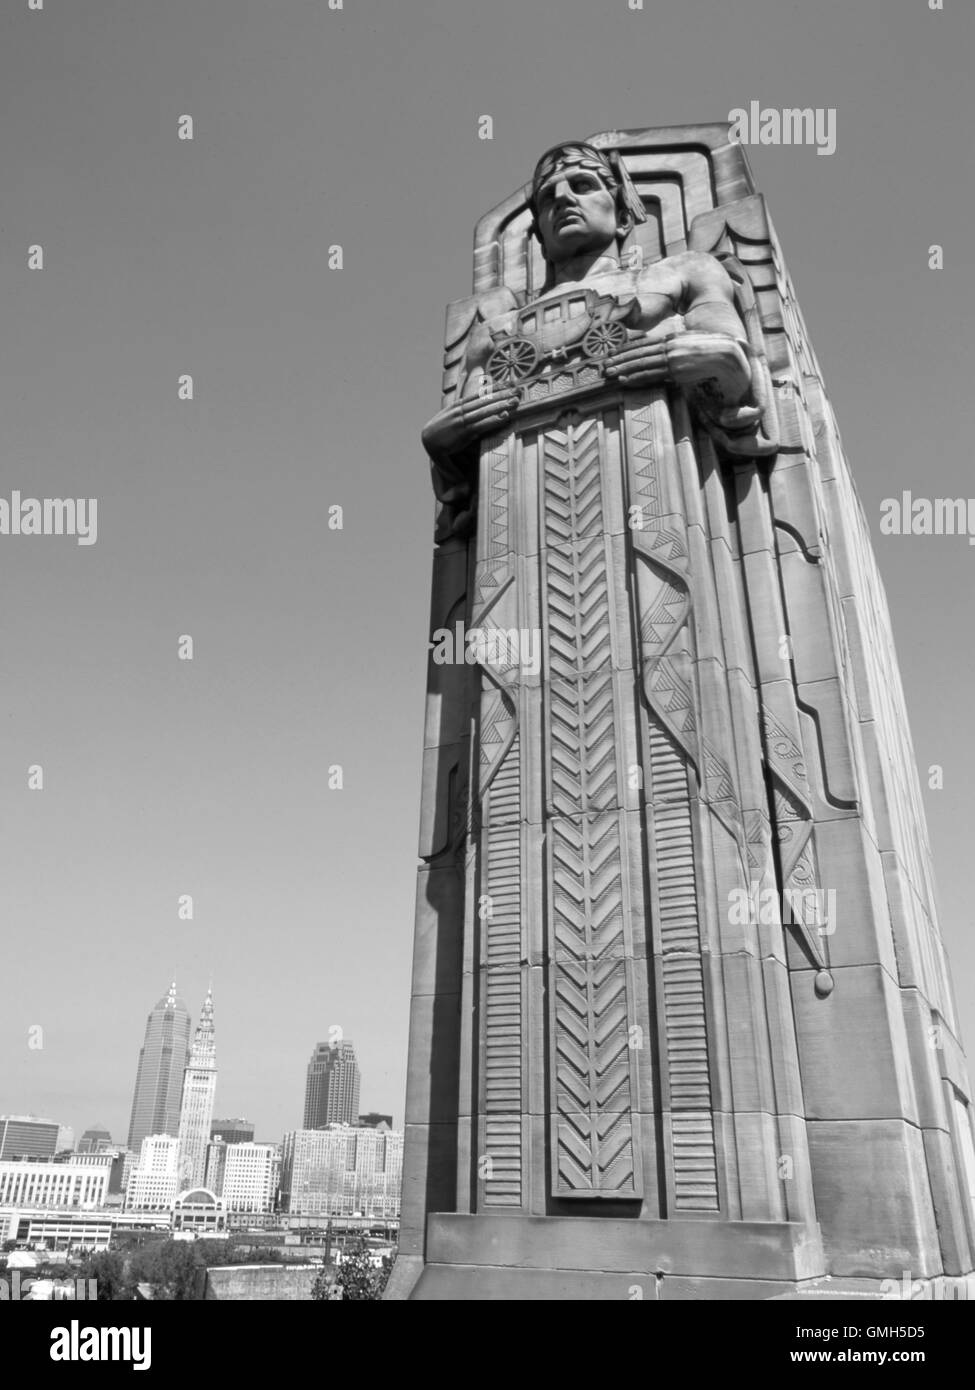 Gods of transportation on the Lorain Carnegie bridge - Stock Image